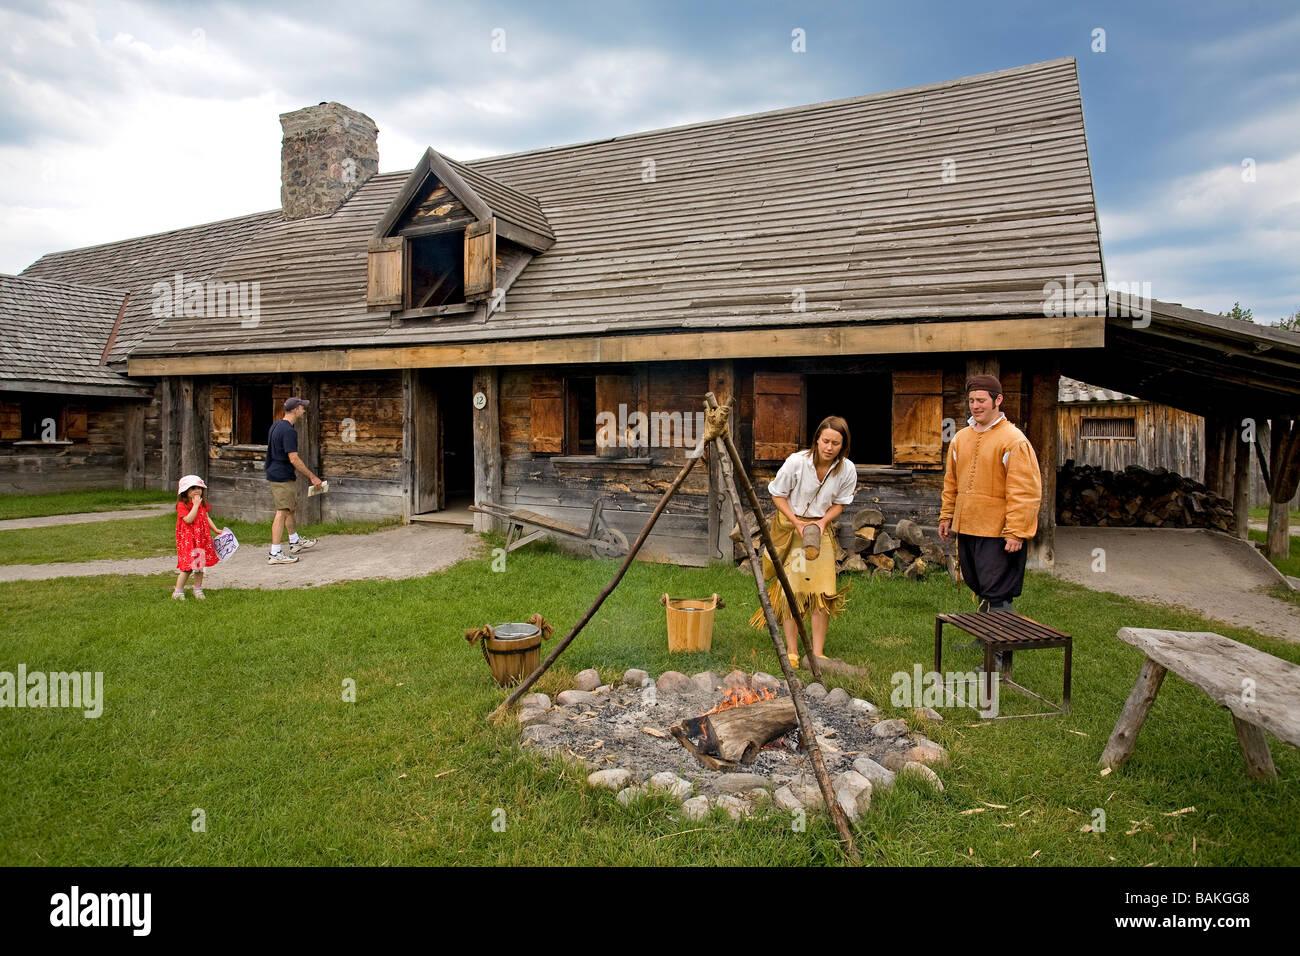 Canada, Ontario Province, Midland-Penetanguishene Region, Sainte Marie among the Hurons, Museum of Hurony and Huron - Stock Image